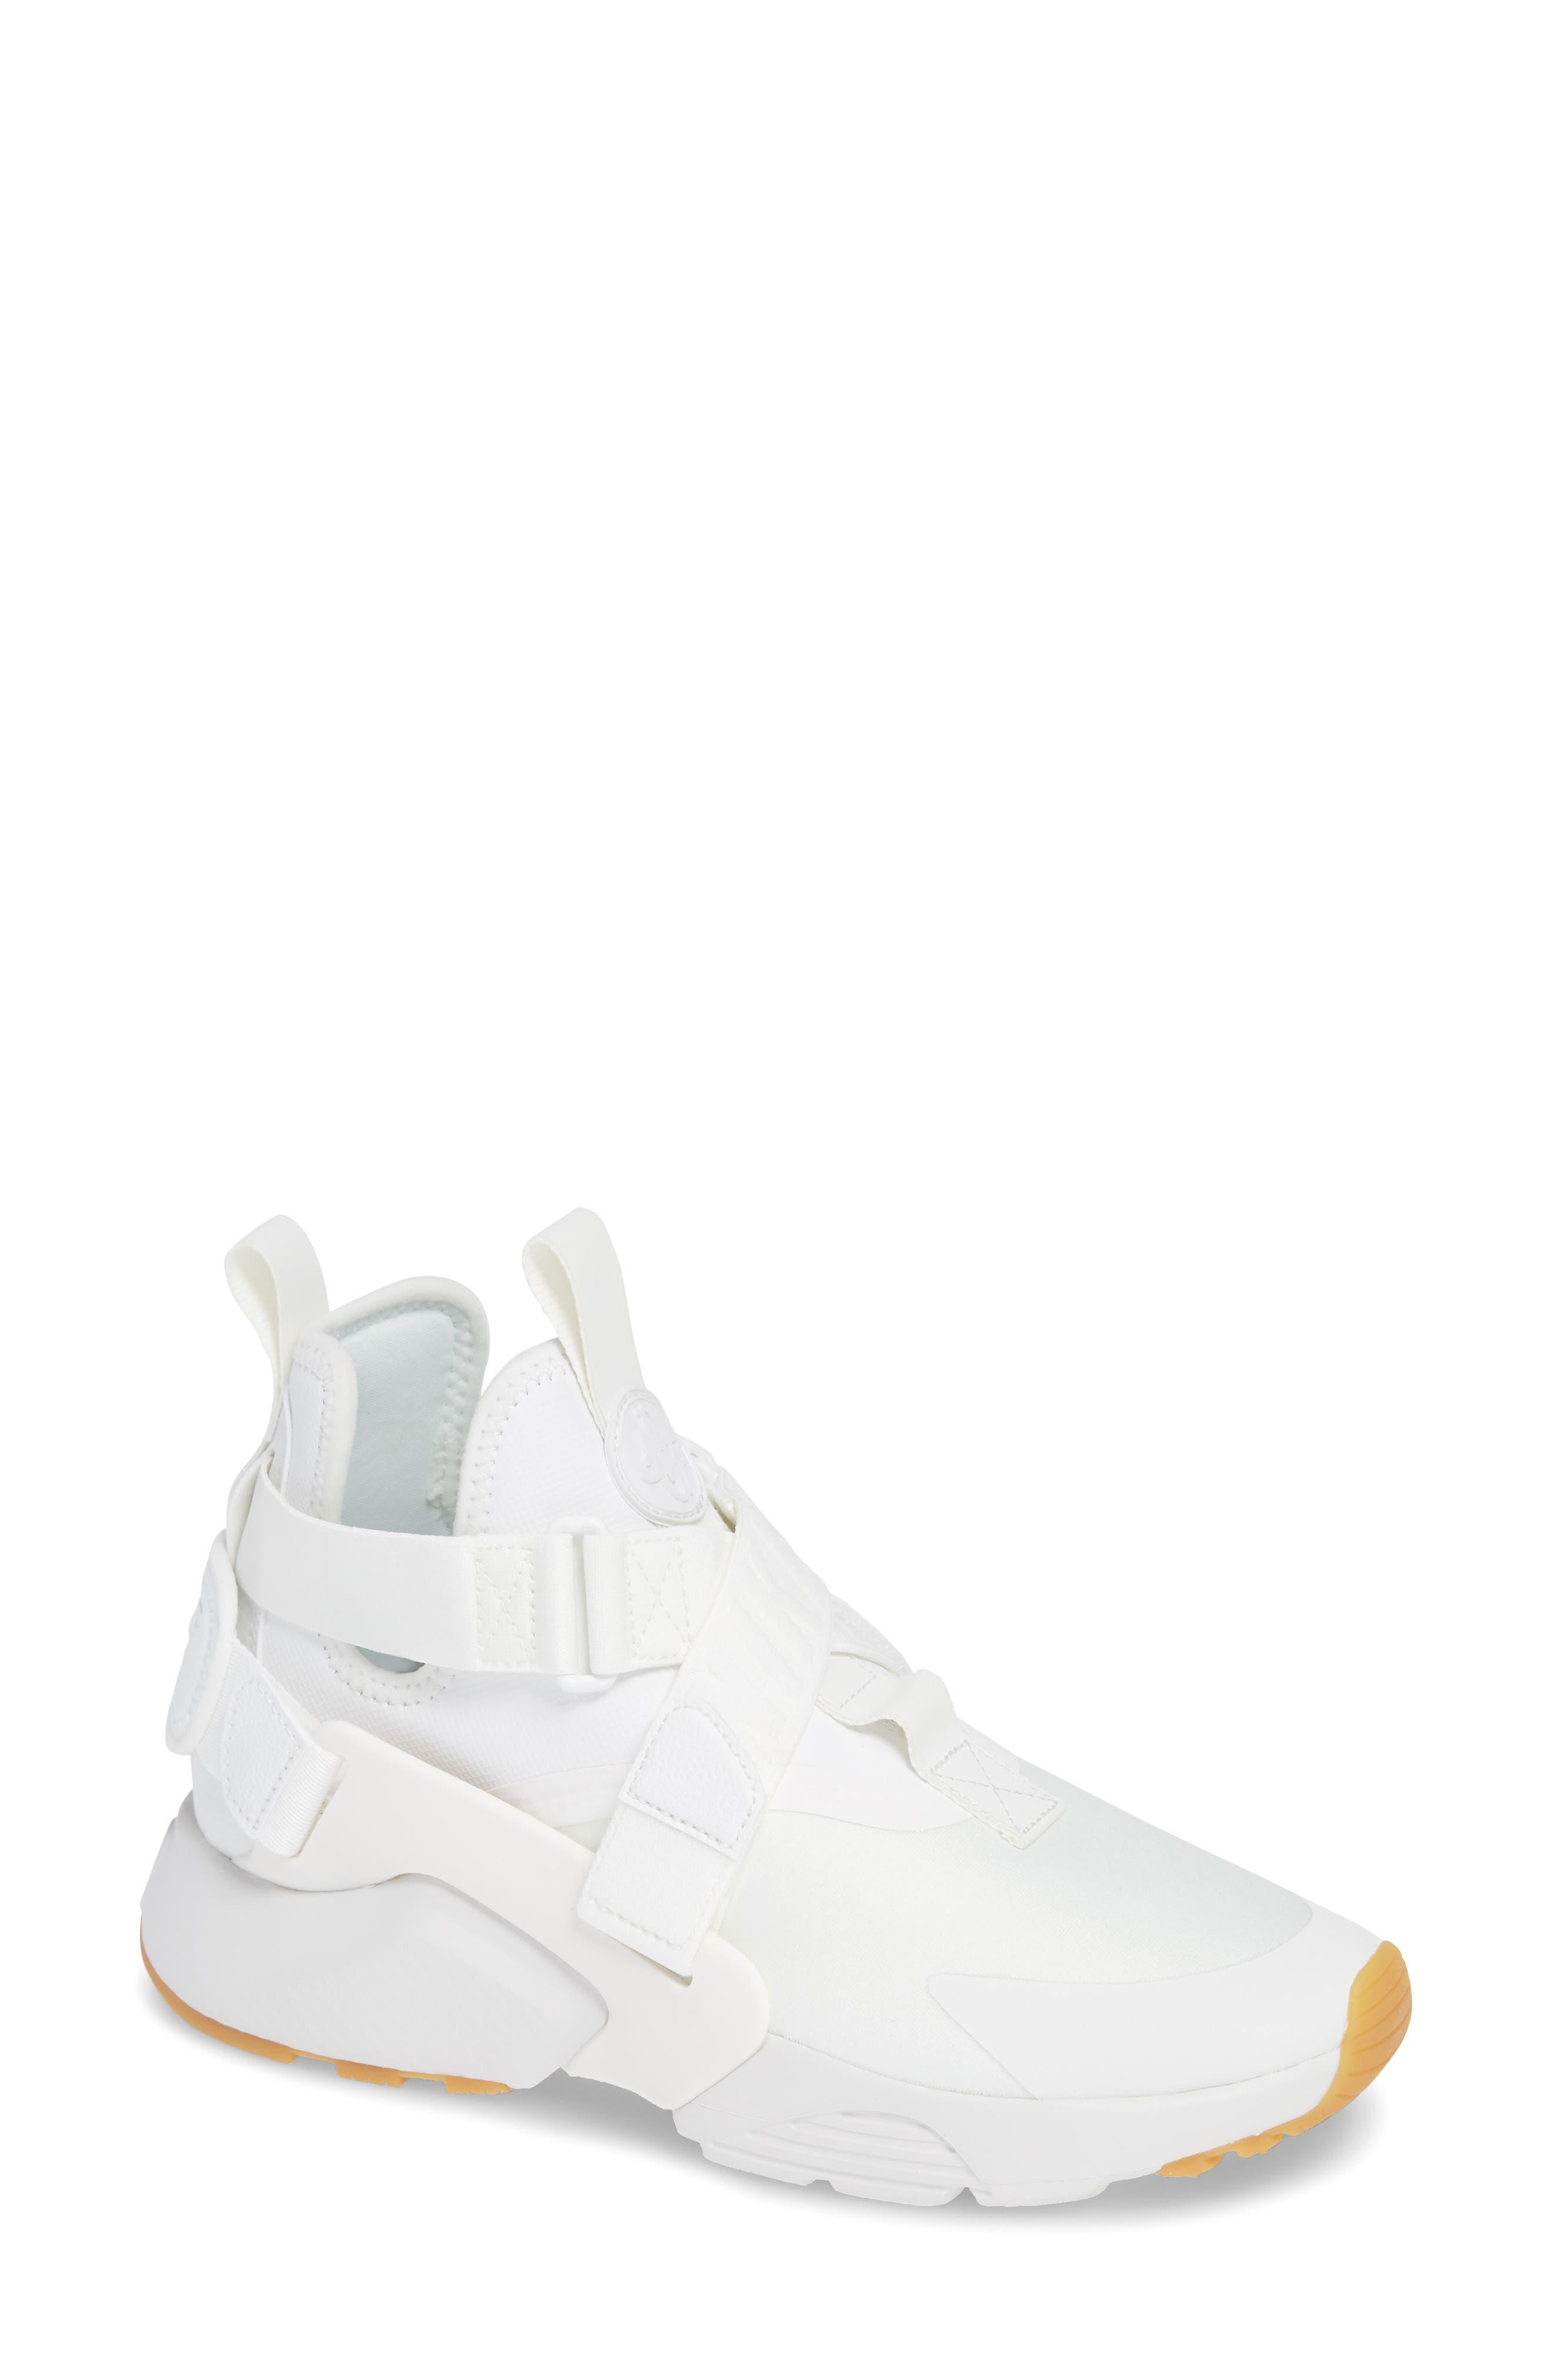 Air Huarache City Sneaker,                             Main thumbnail 1, color,                             104